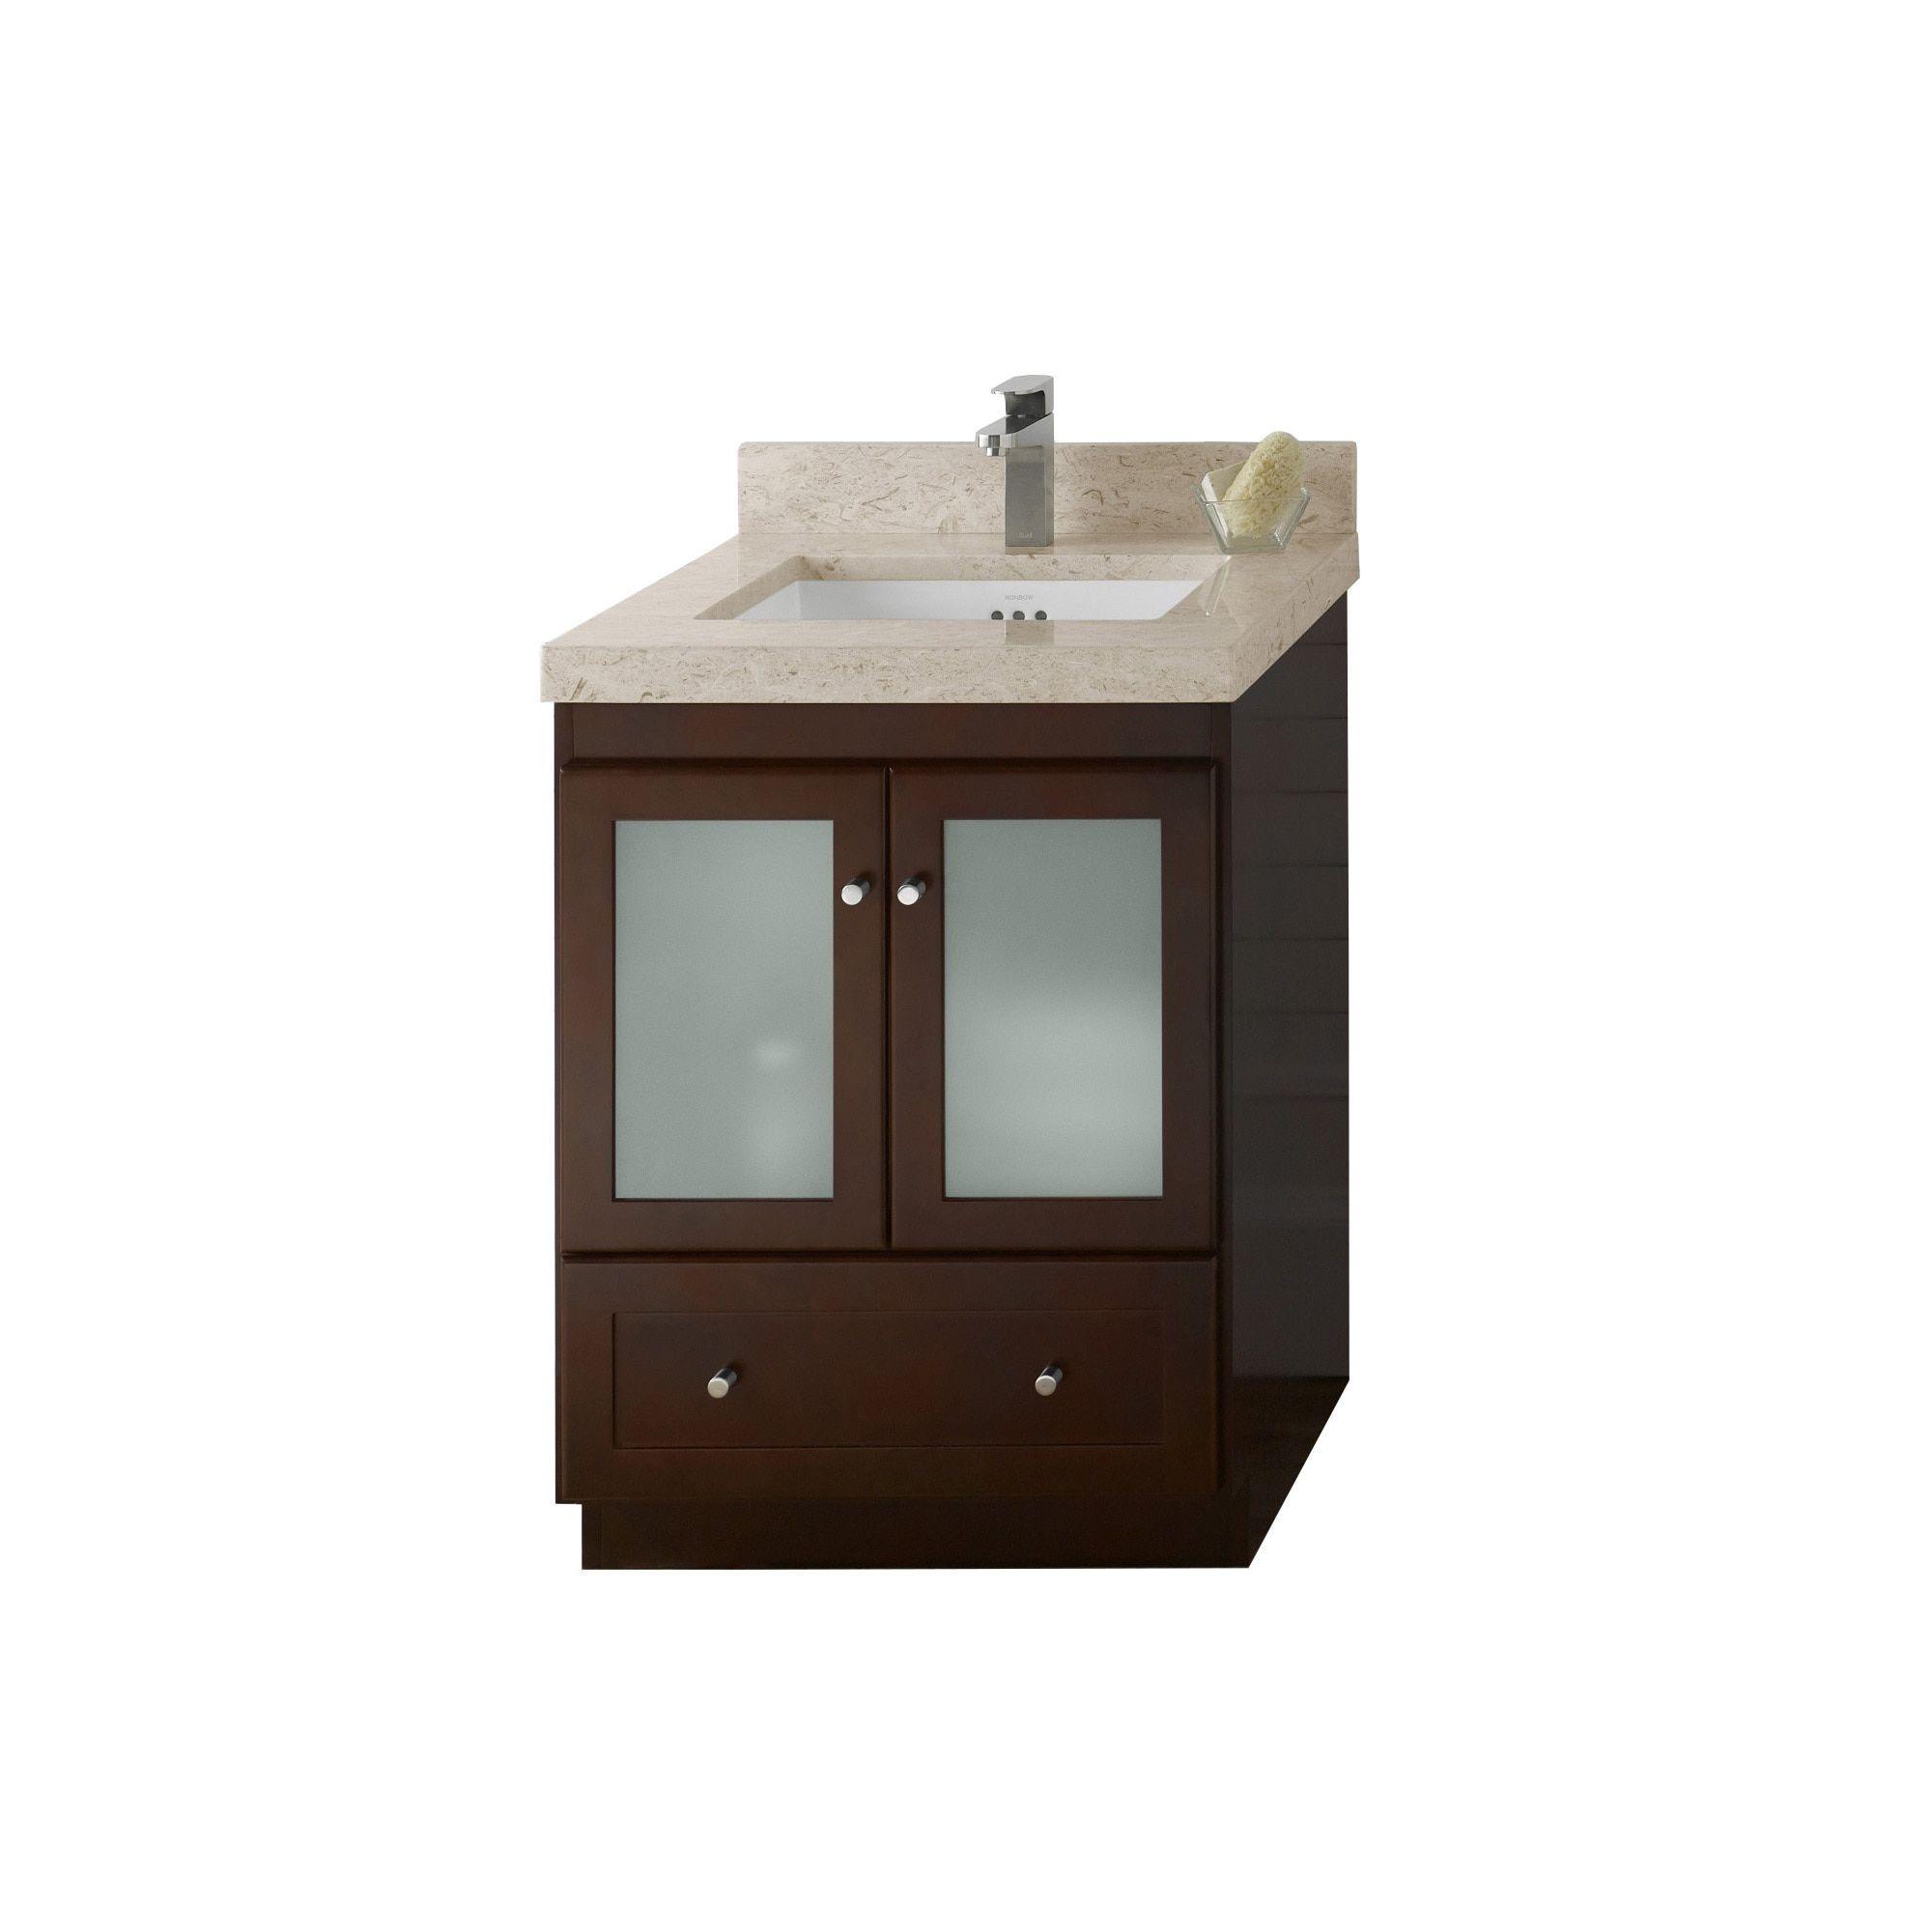 Ronbow Shaker 24 Inch Bathroom Vanity Set In Dark Cherry Marble